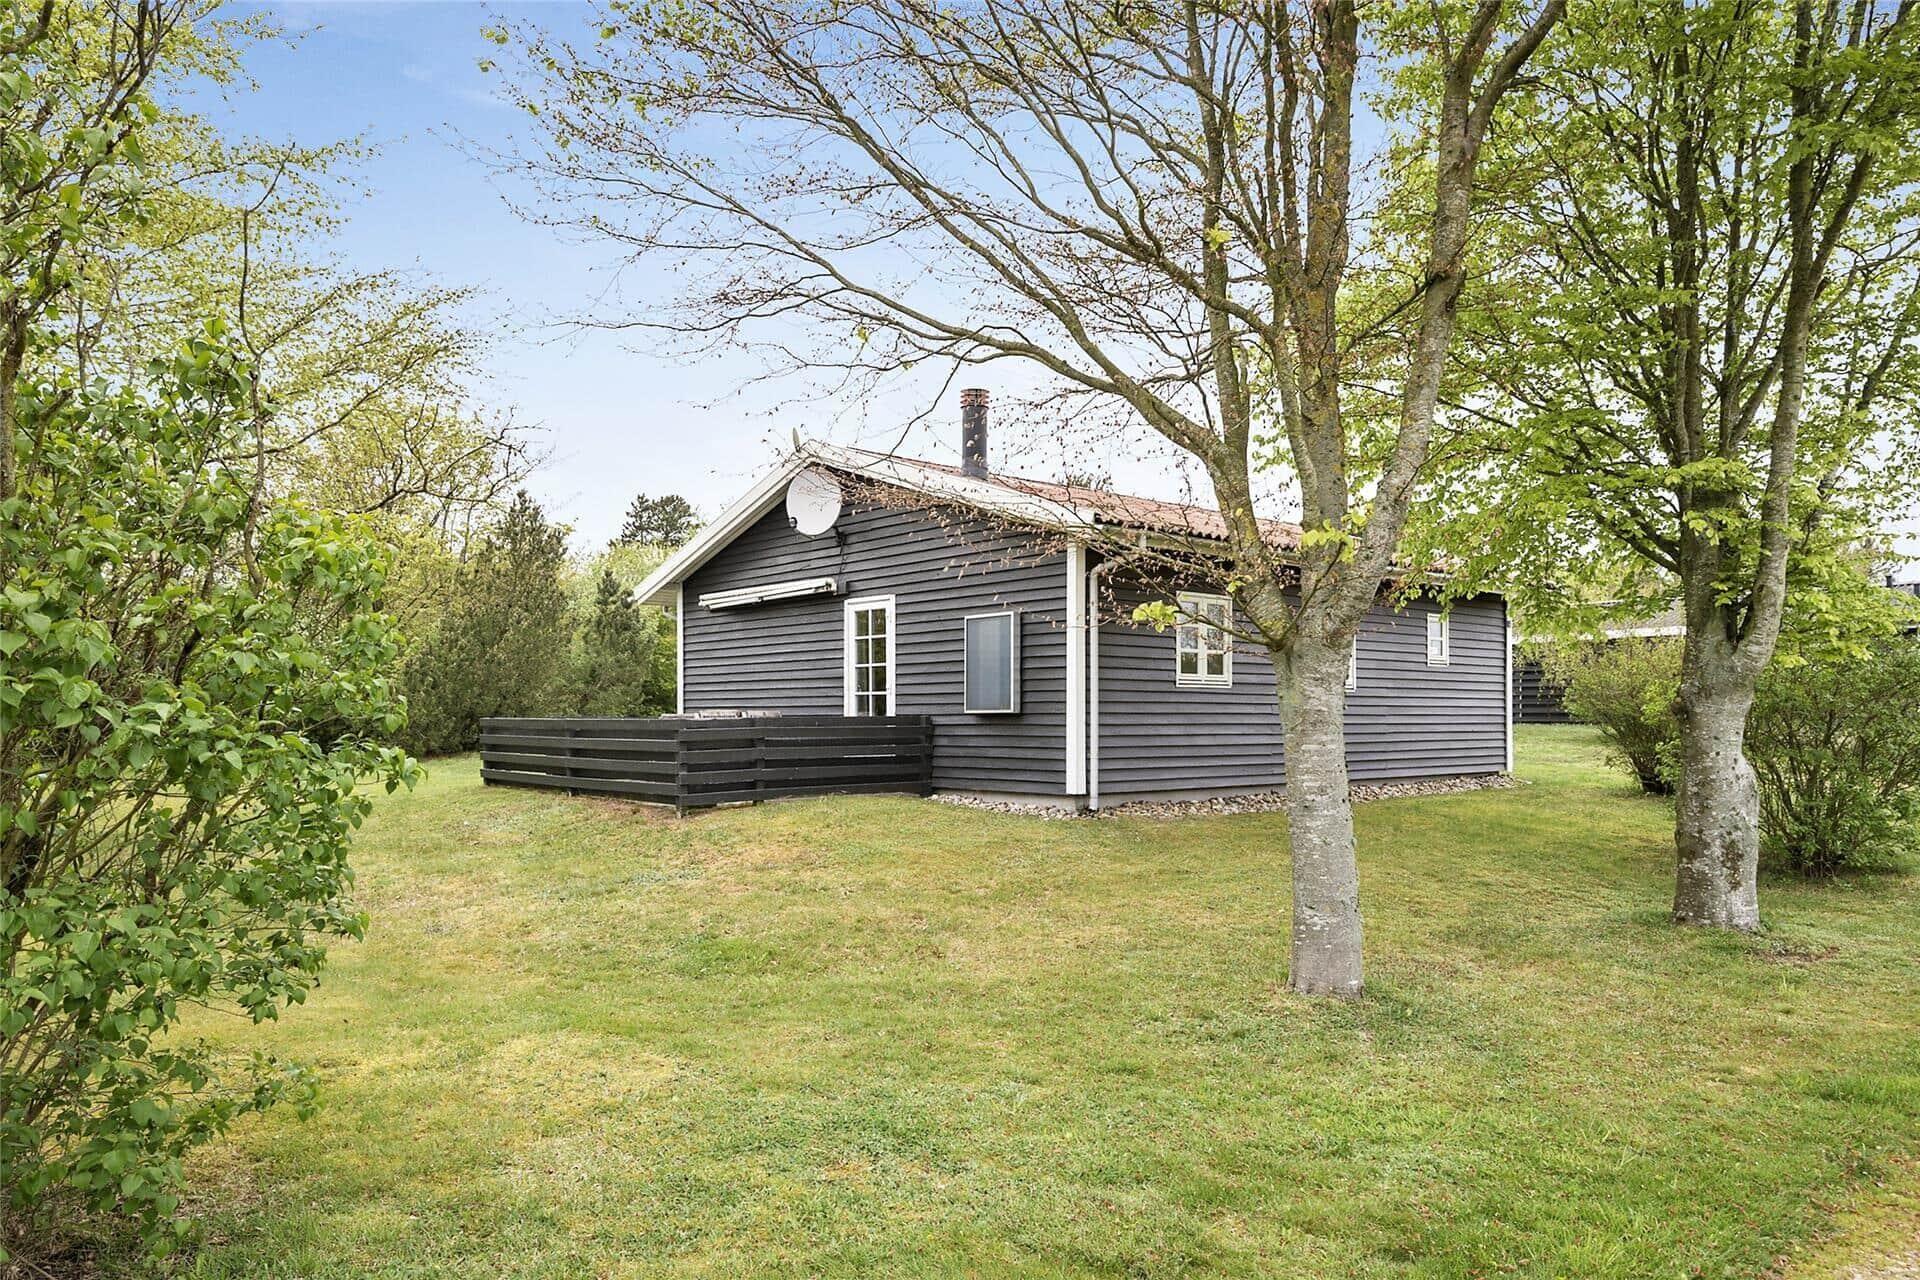 Billede 1-22 Sommerhus C11233, Egernvej 5, DK - 6893 Hemmet